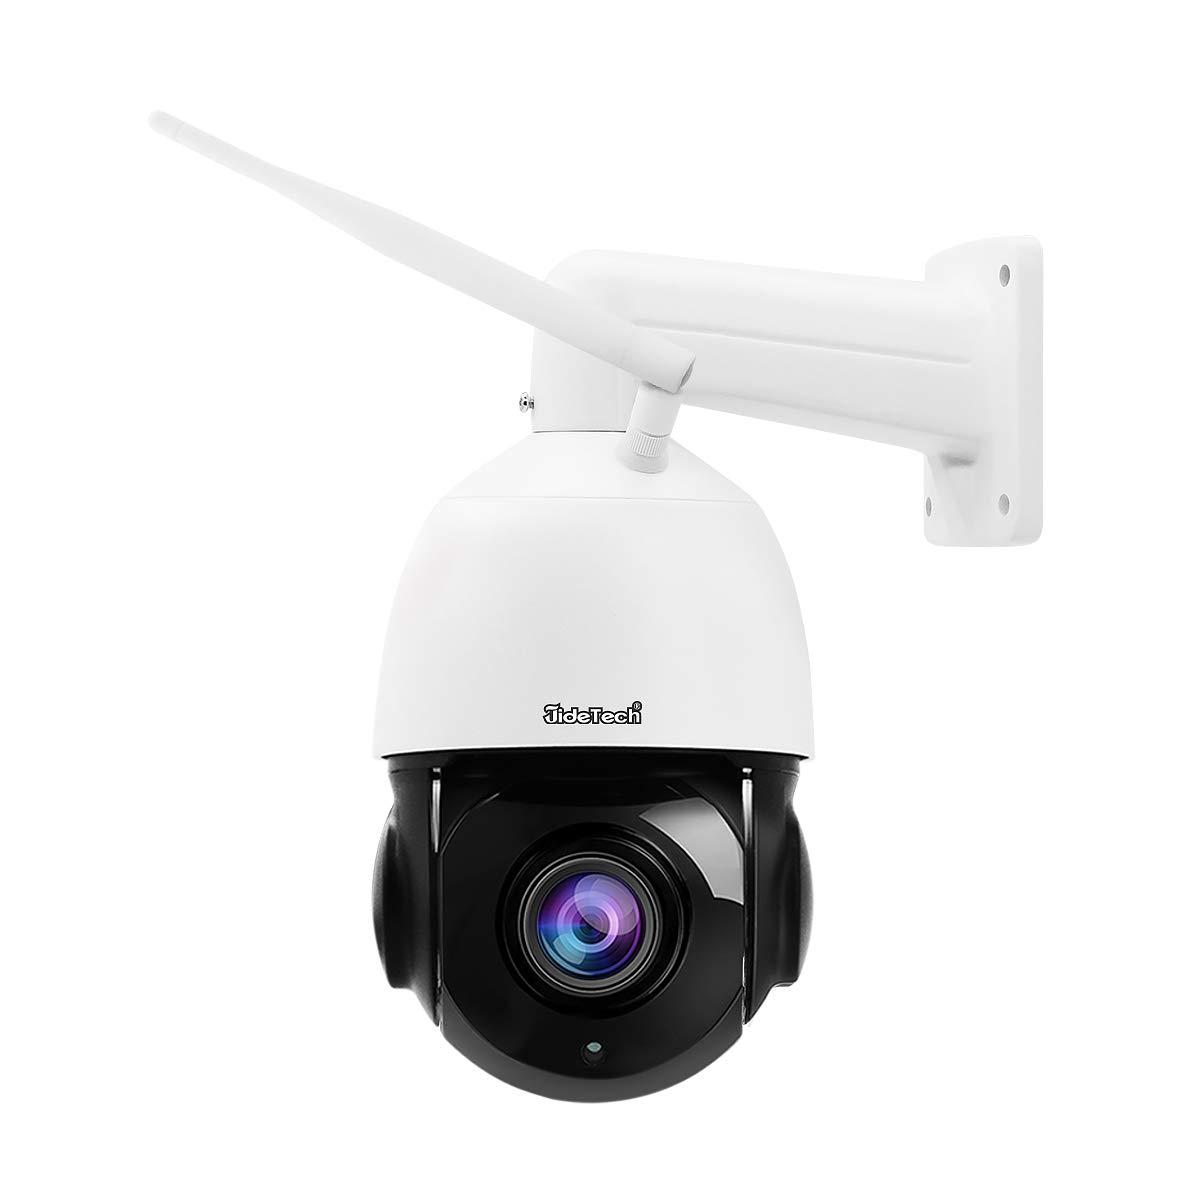 5MP PTZ WiFi Security Camera Outdoor, 20x Zoom Smart Surveillance IP Camera, 1000ft View Distance/SDM Array IR Night Vision/Detection Alarm / 2-Way Audio/SD Card Slot/ONVIF/ IP66 Waterproof